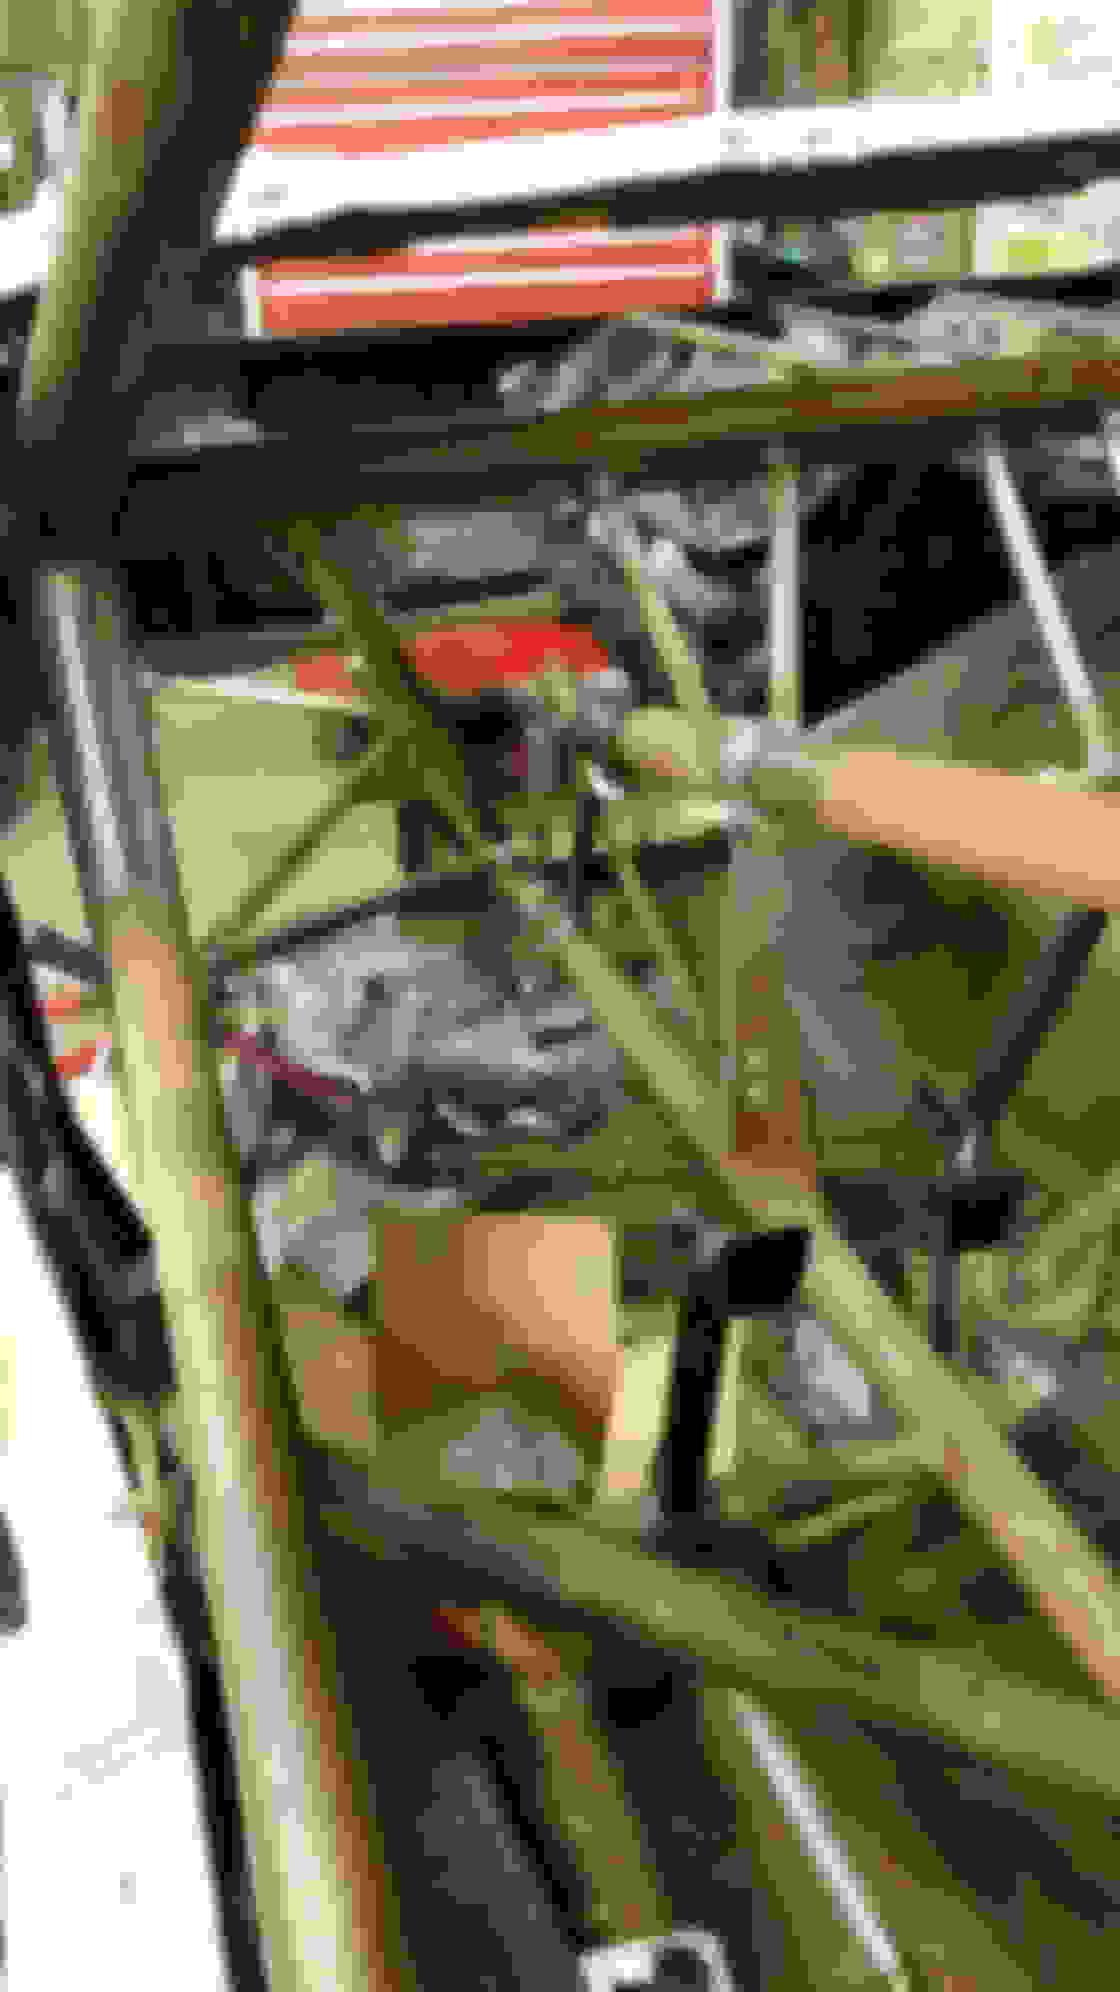 1991 Camaro full chassis drag car build - Third Generation F